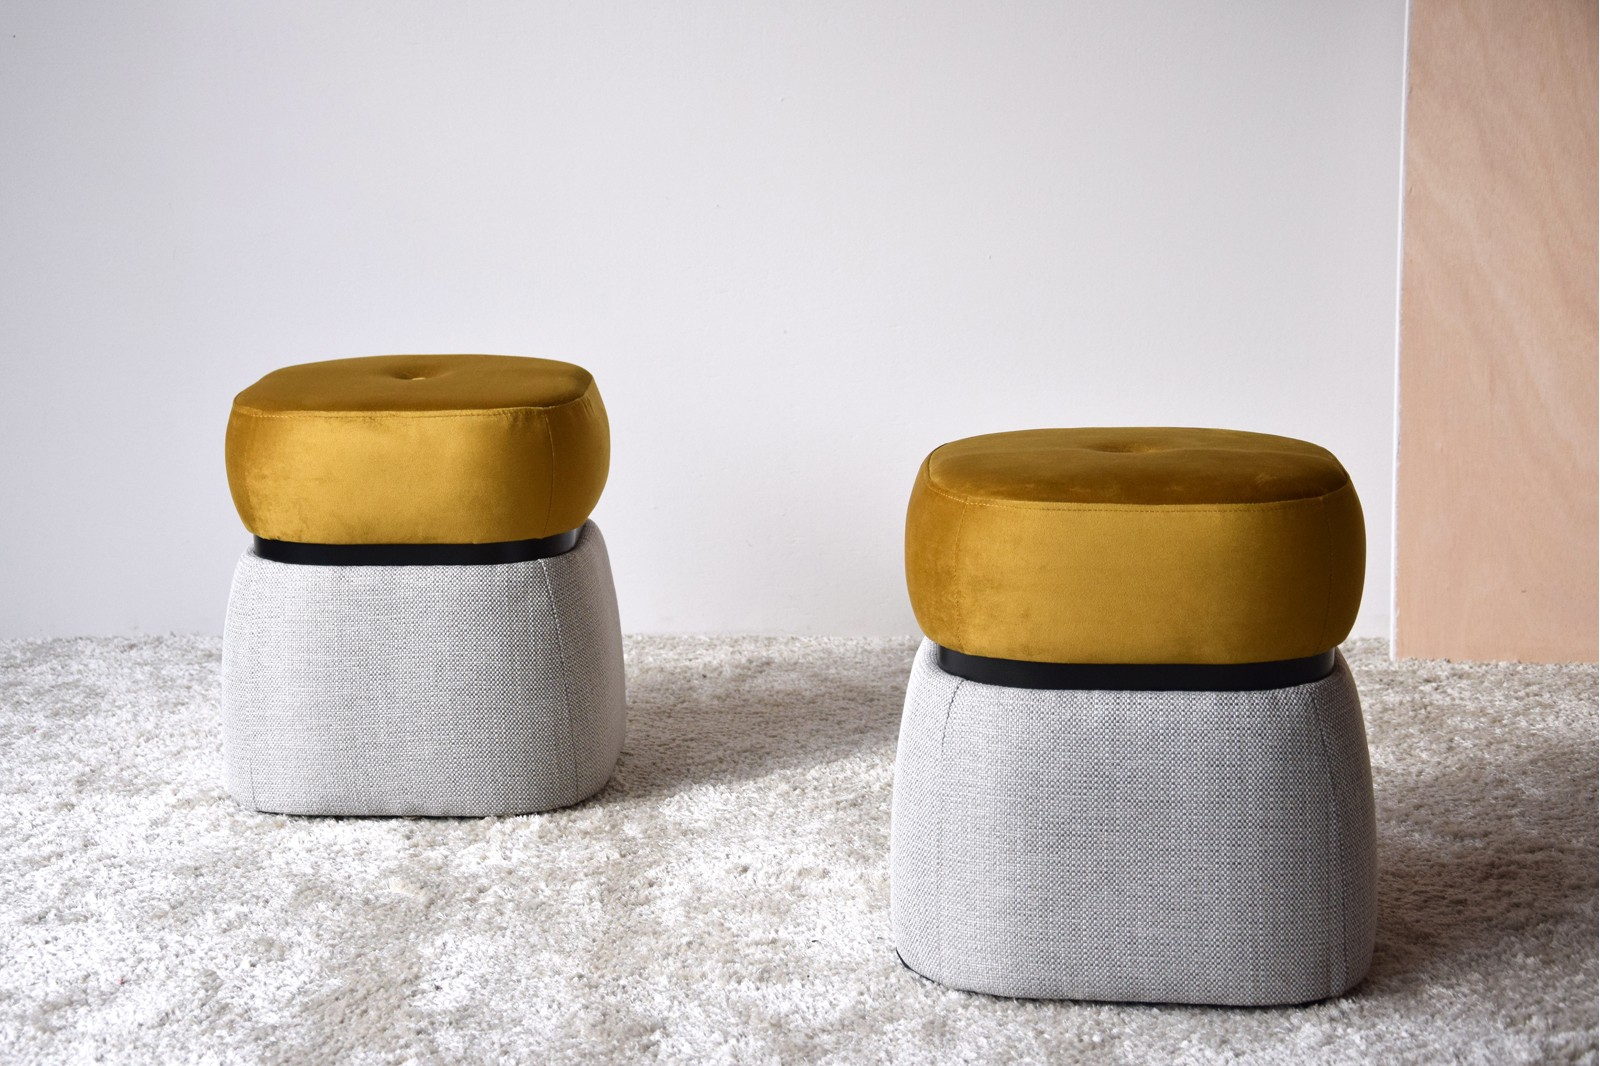 SET 2 STOOLS. BEIGE AND DARK MUSTARD YELLOW